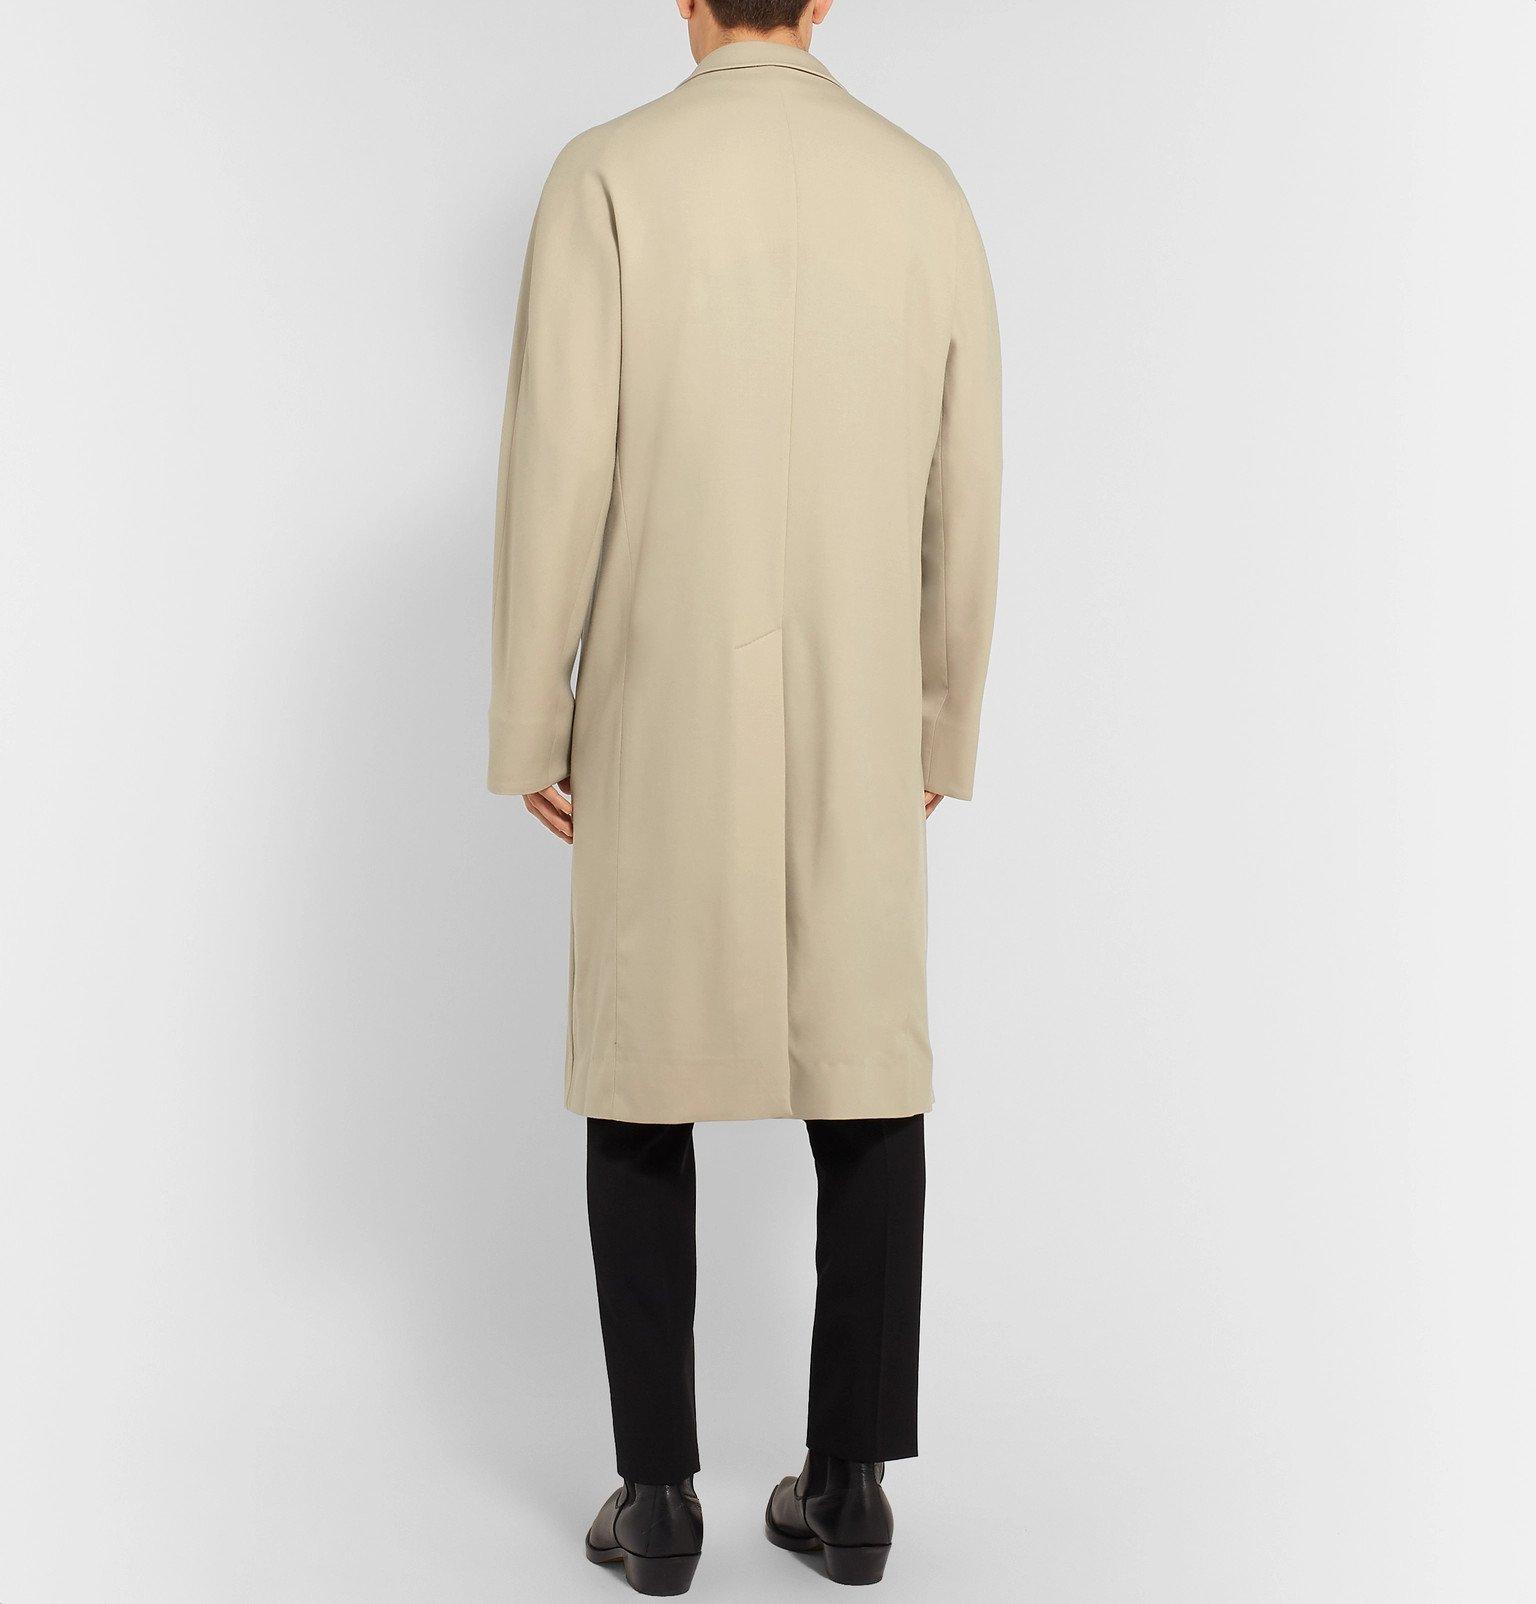 Haider Ackermann - Wool-Blend Coat - Cream